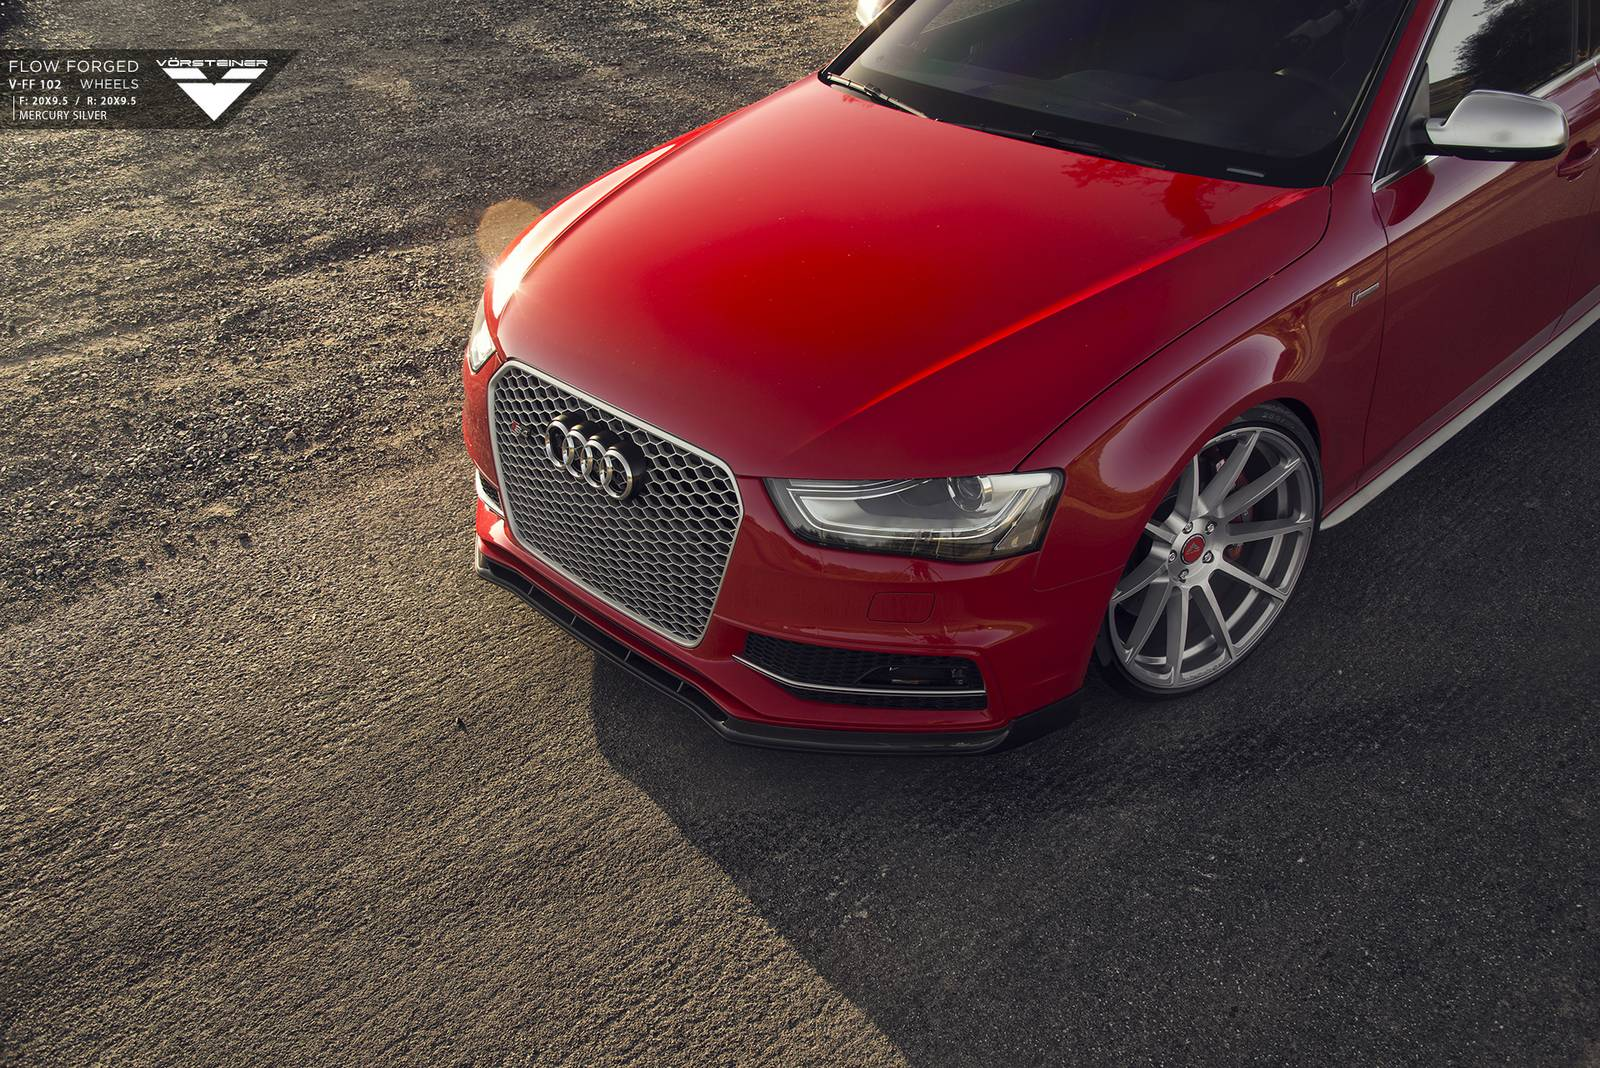 Audi S4 tuning/тюнинг Vorsteiner wheels+splitter   колеса + сплиттер